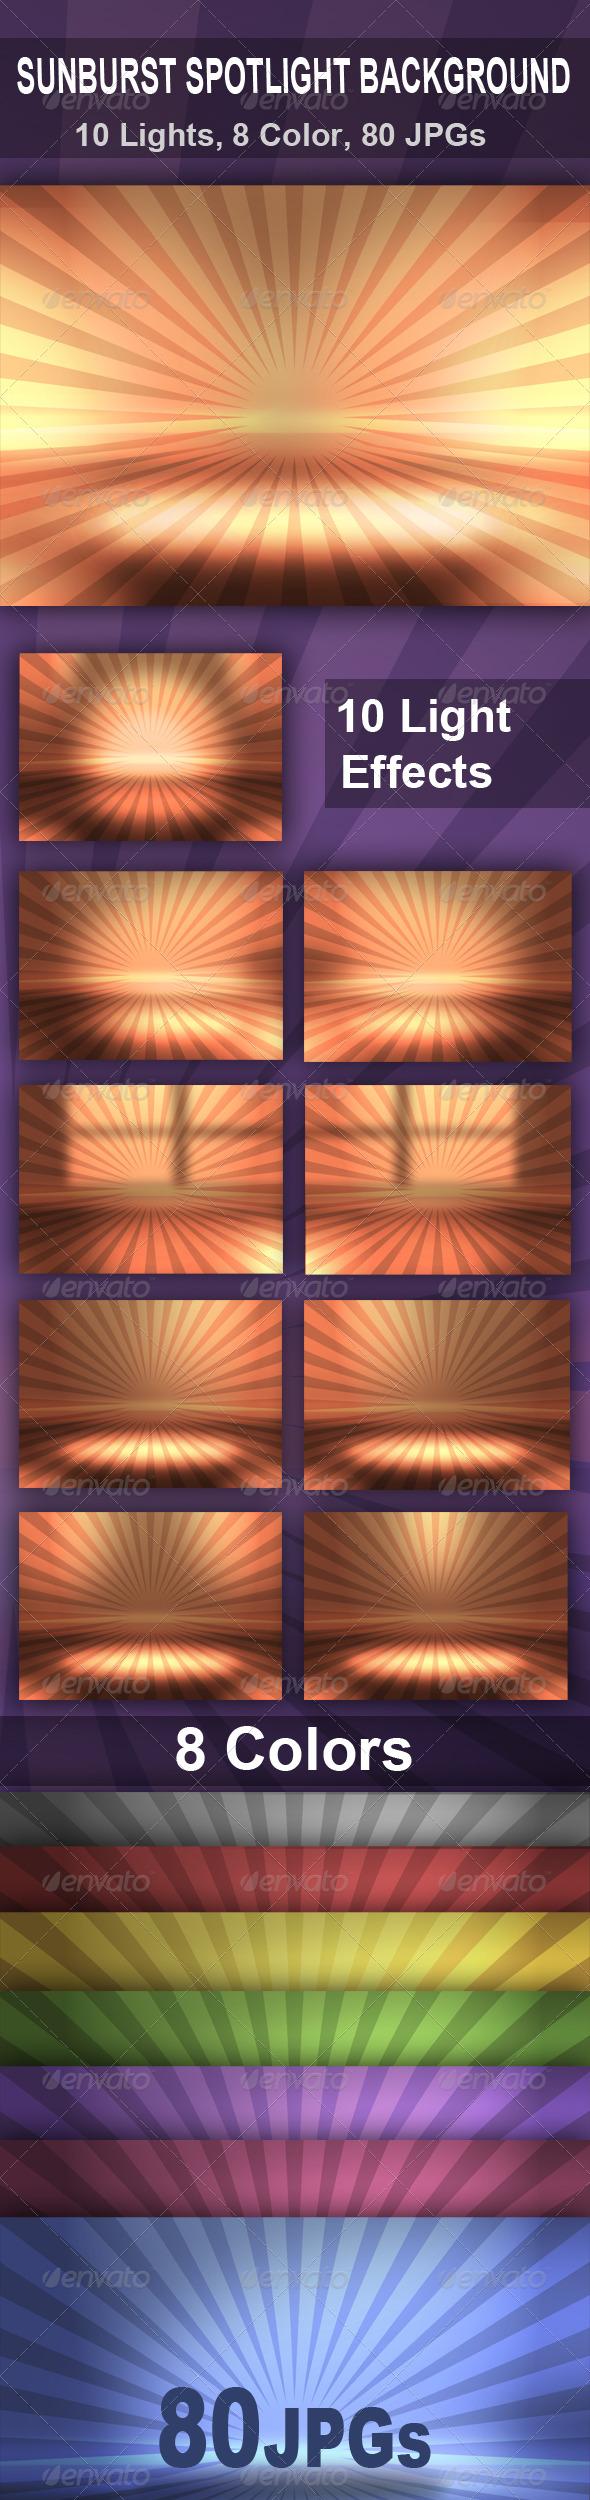 Sunburst Spotlight Background - Backgrounds Graphics